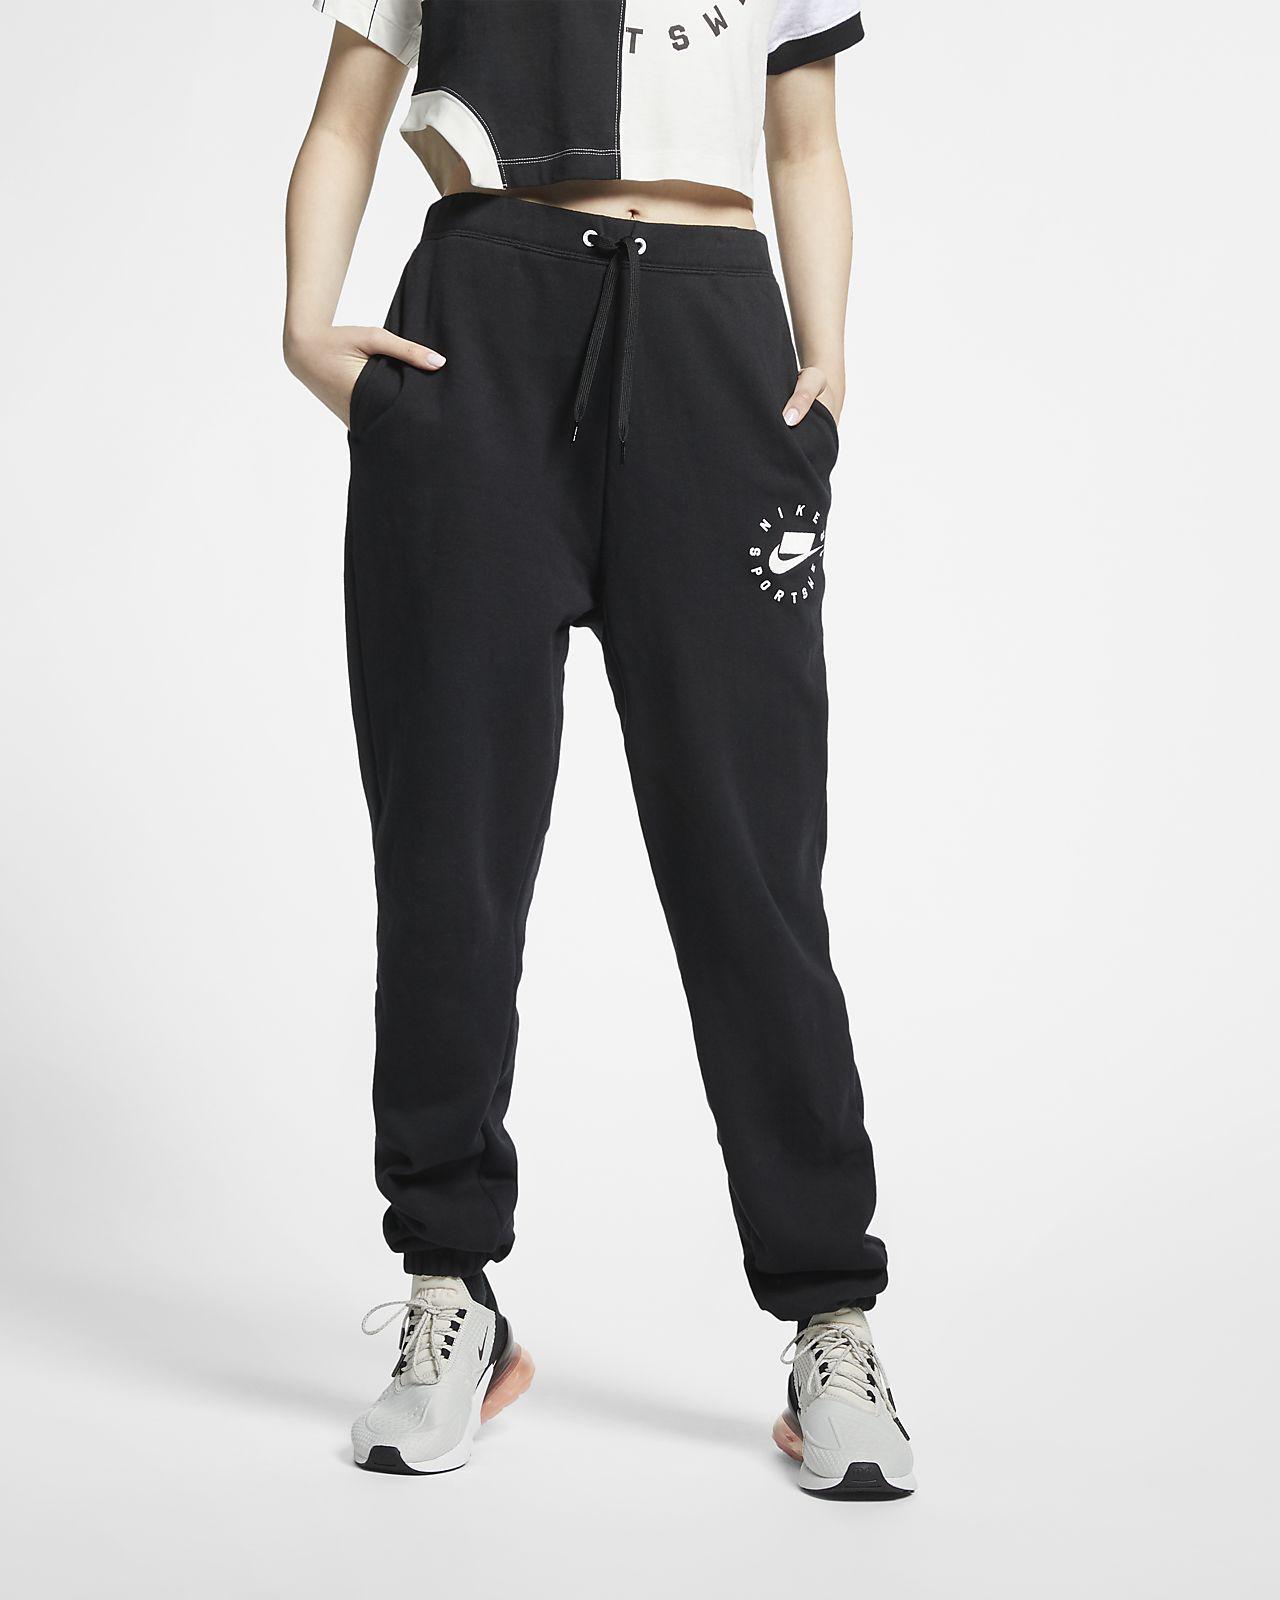 Nike Sportswear NSW Pantalons de teixit French Terry - Dona